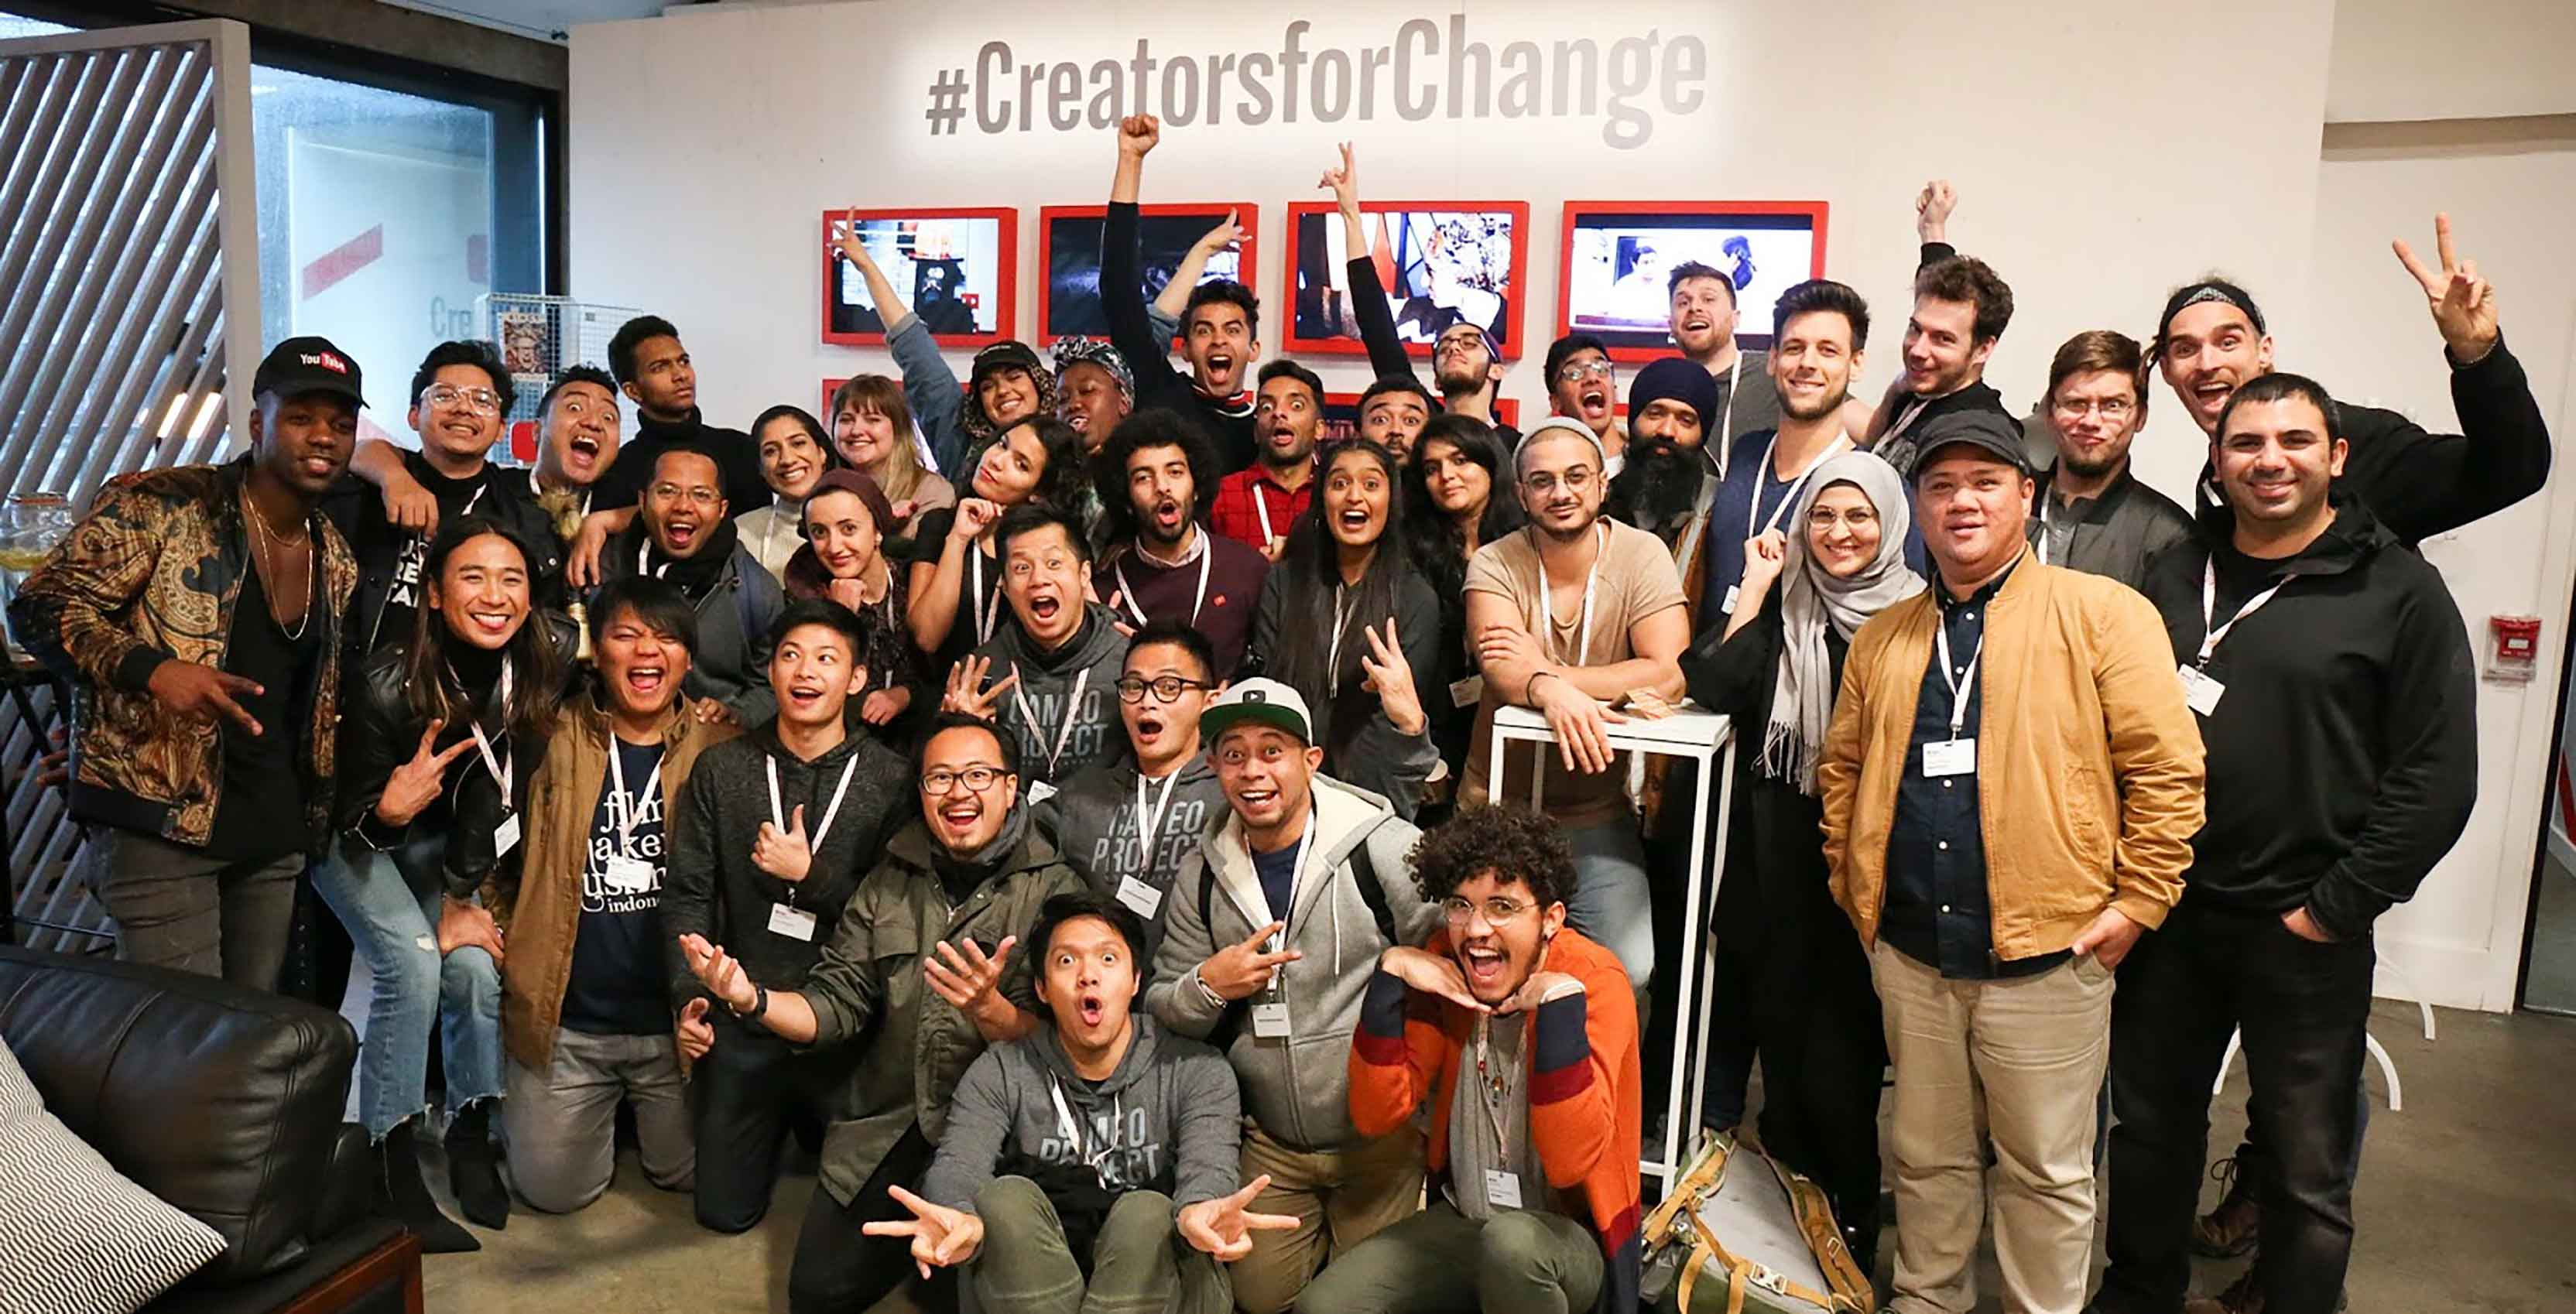 YouTube Creators for Change program